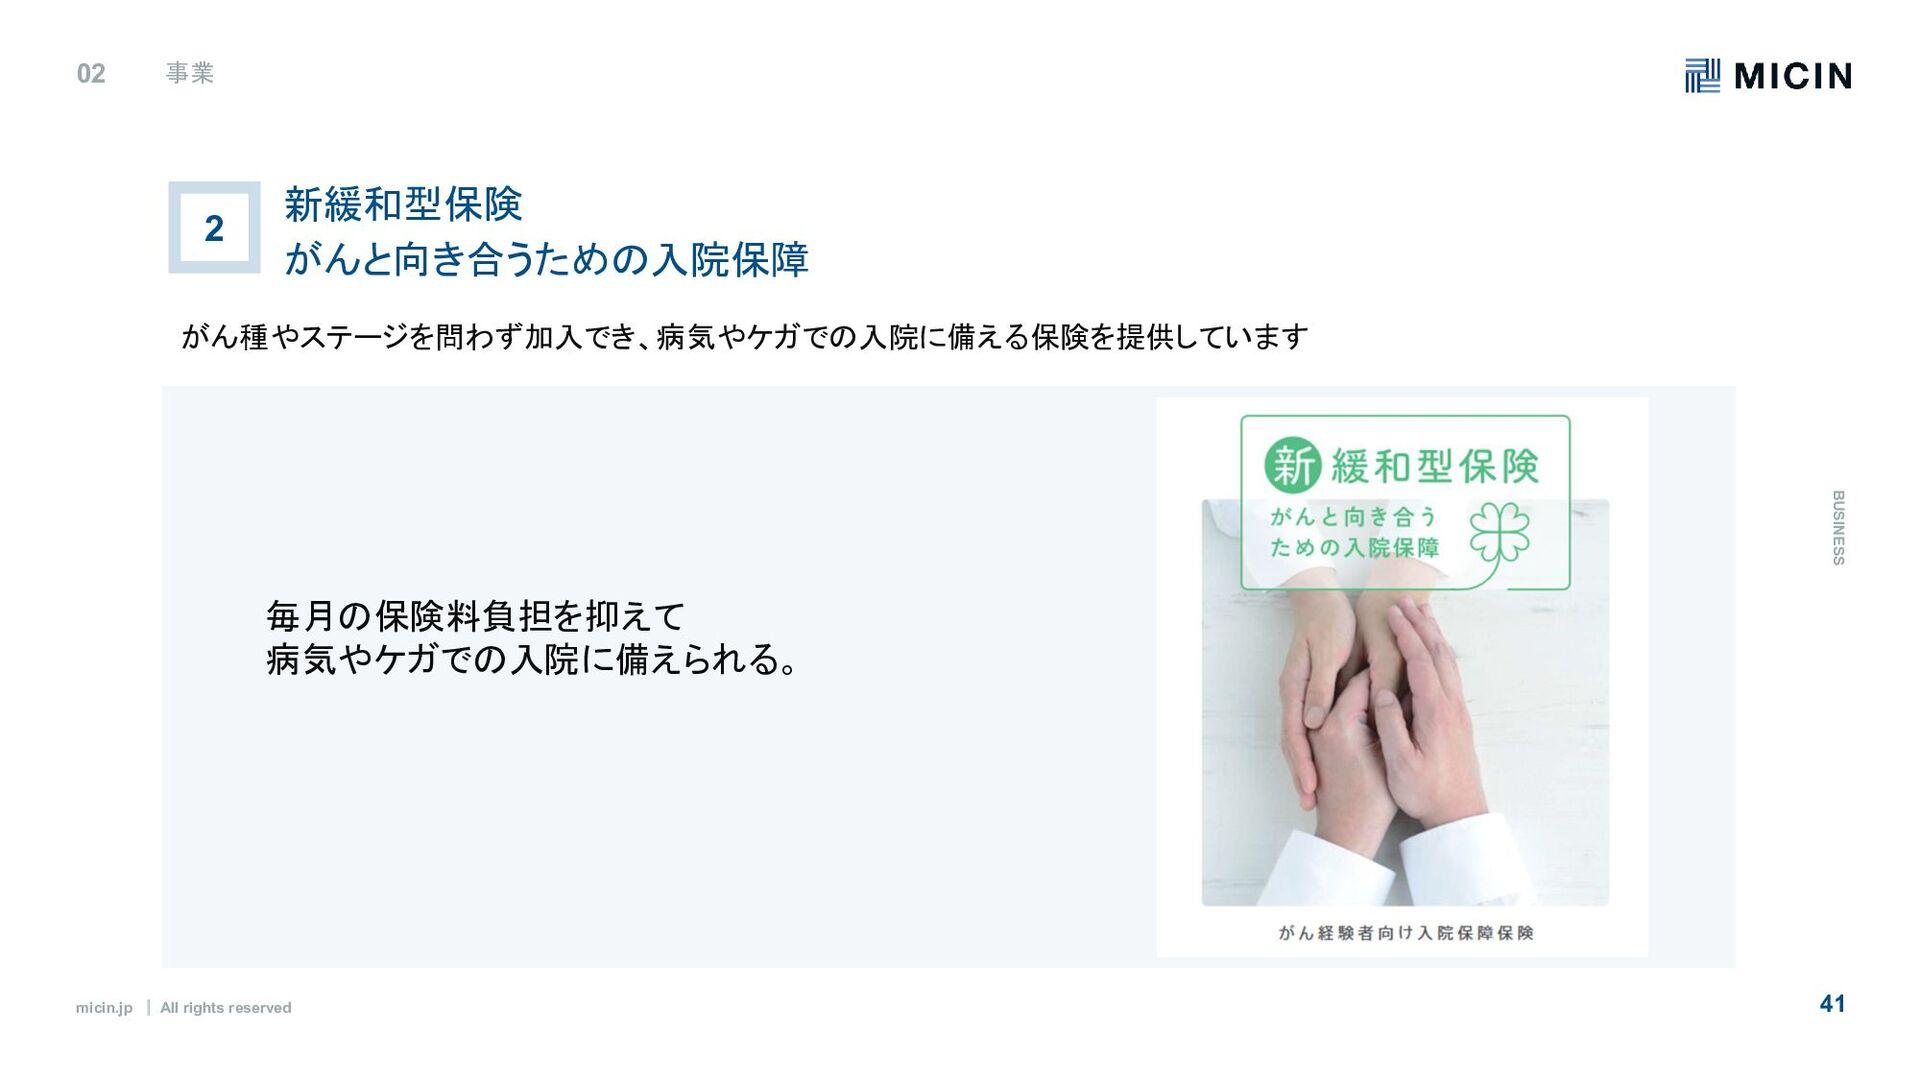 micin.jp ʛ All rights reserved 41 メンバー紹介 03 Y.T...